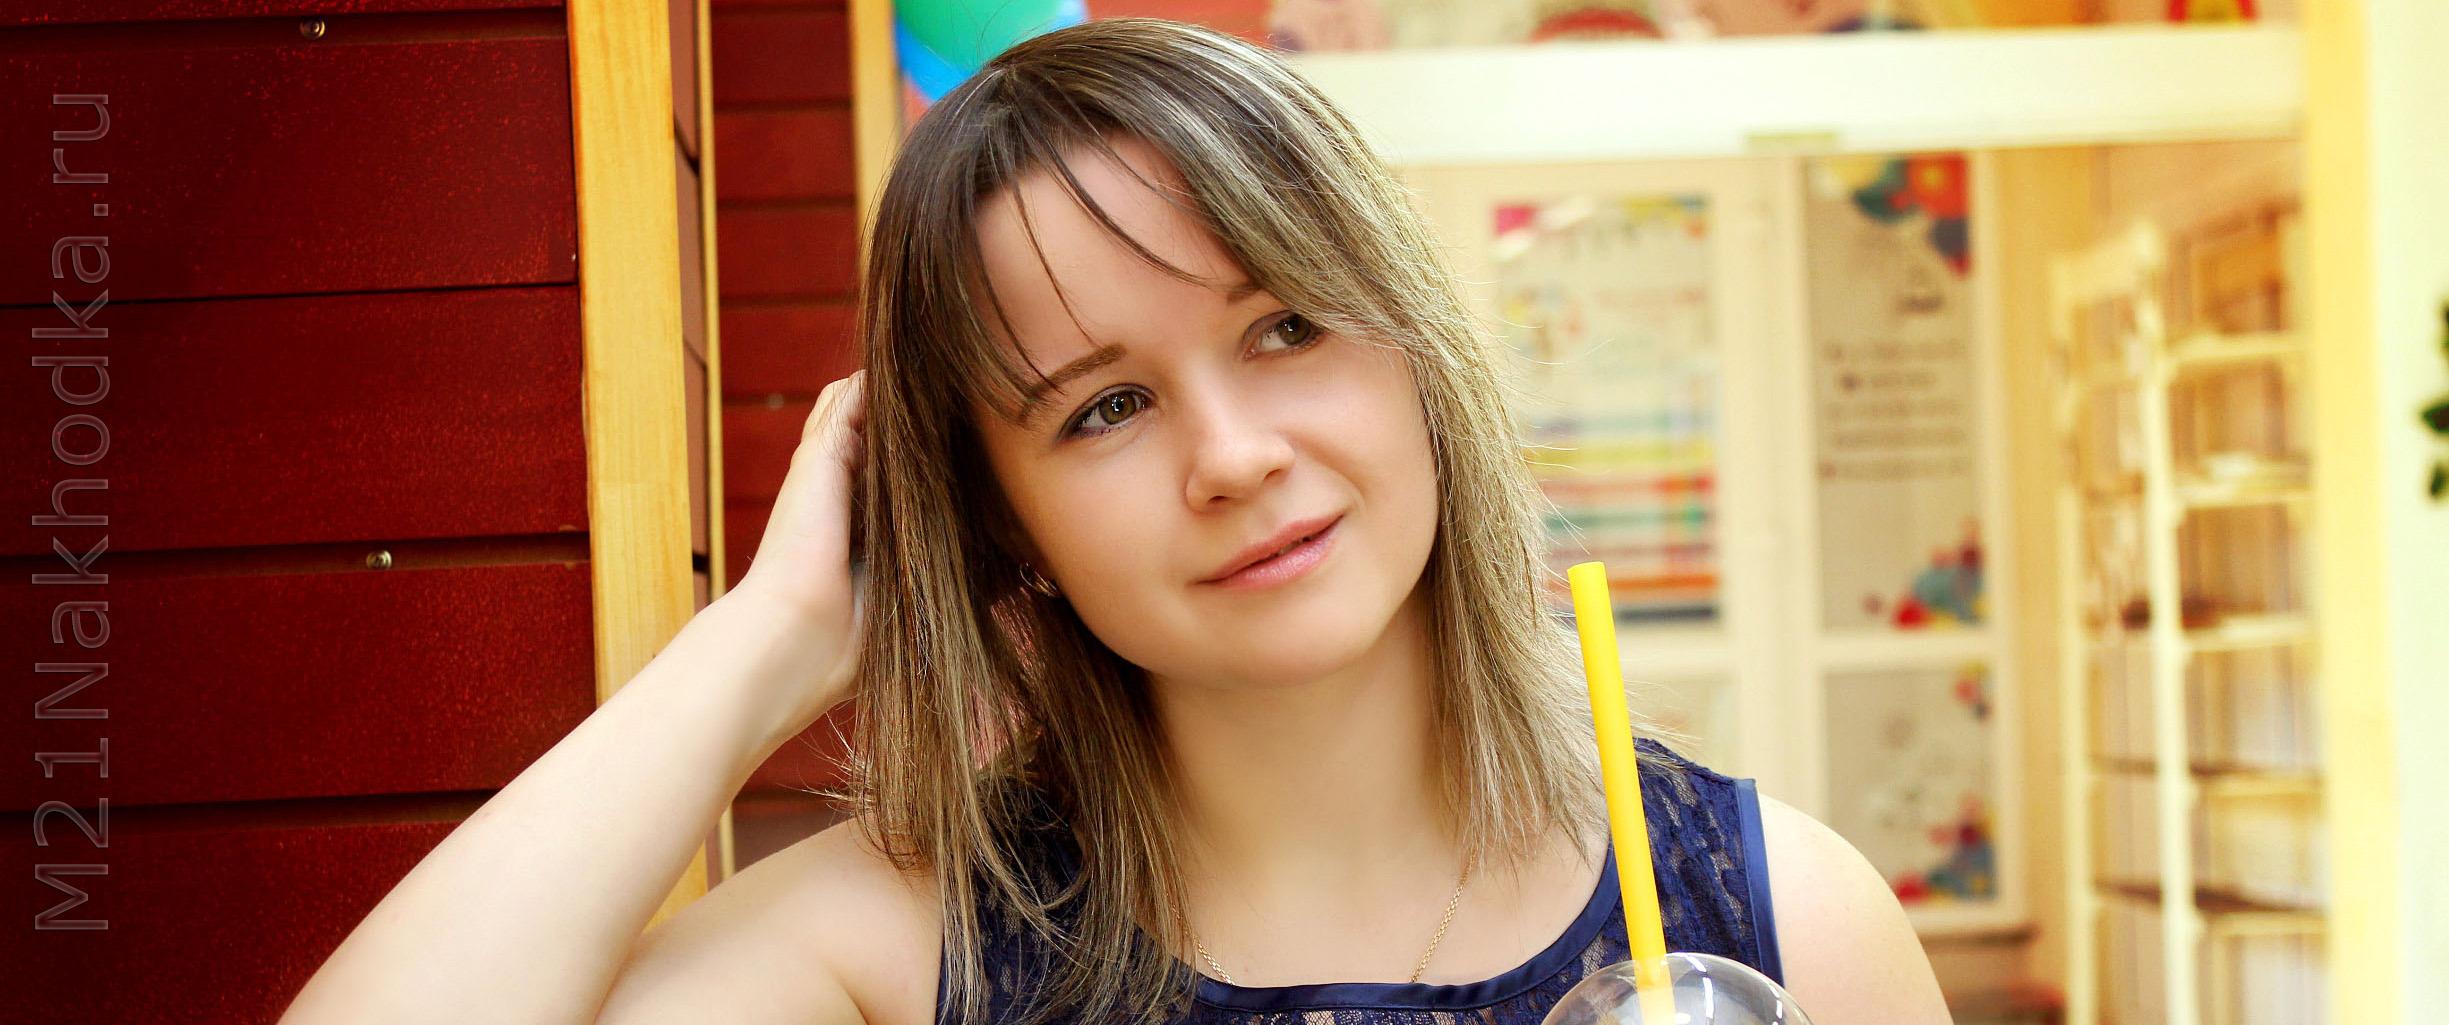 Анастасия КОСИЦЫНА, модель, thumb